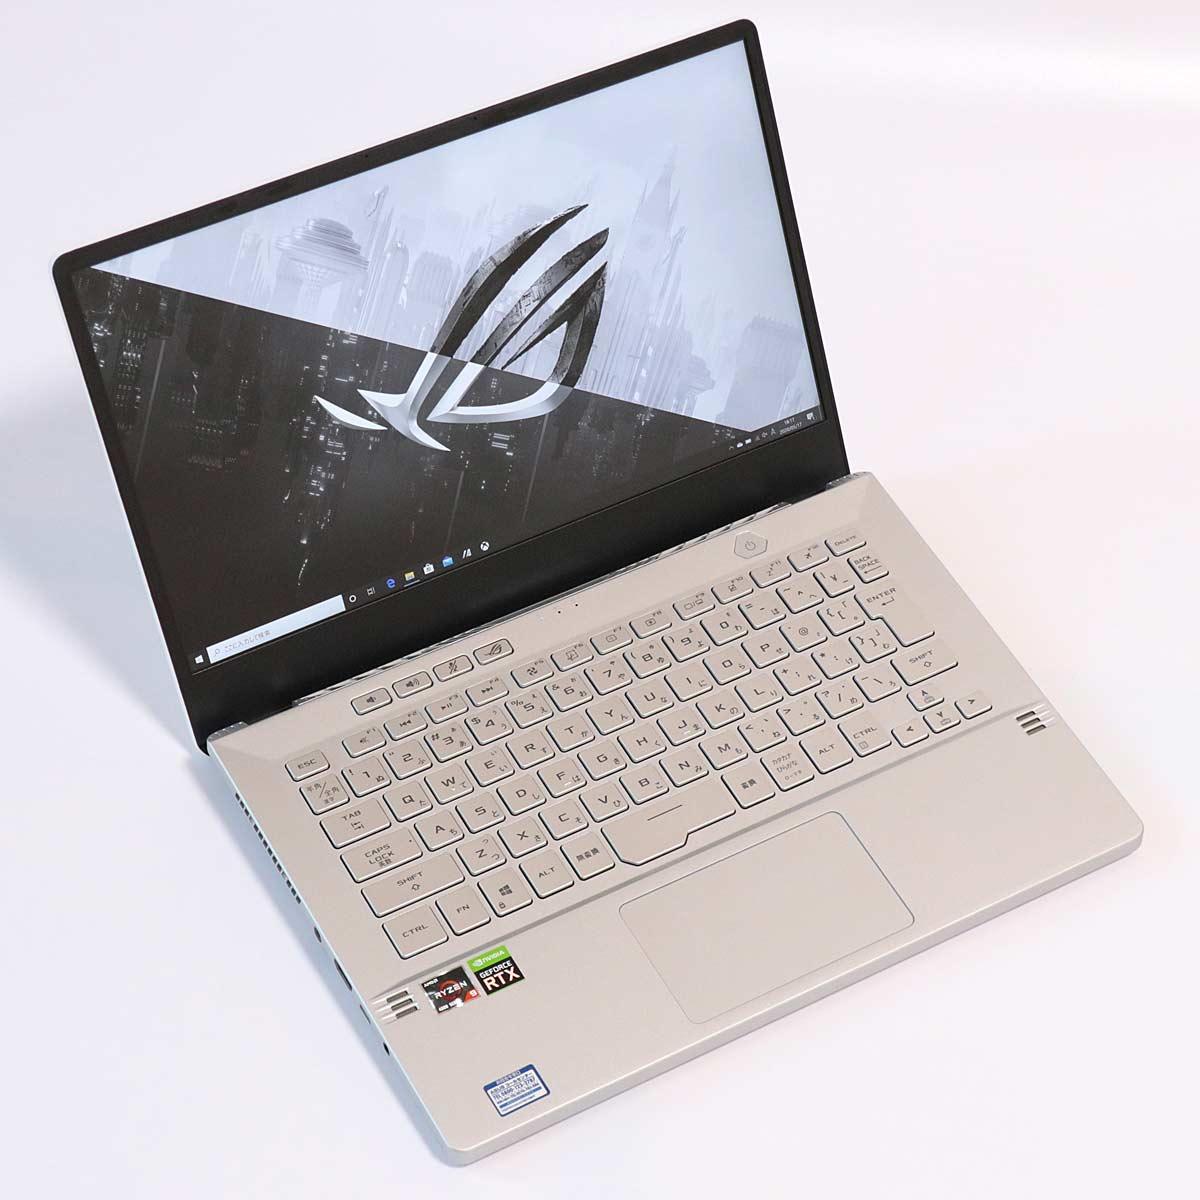 「Ryzen 9 4900HS」搭載のゲーミングPC「ROG ZEPHYRUS G14」レビュー